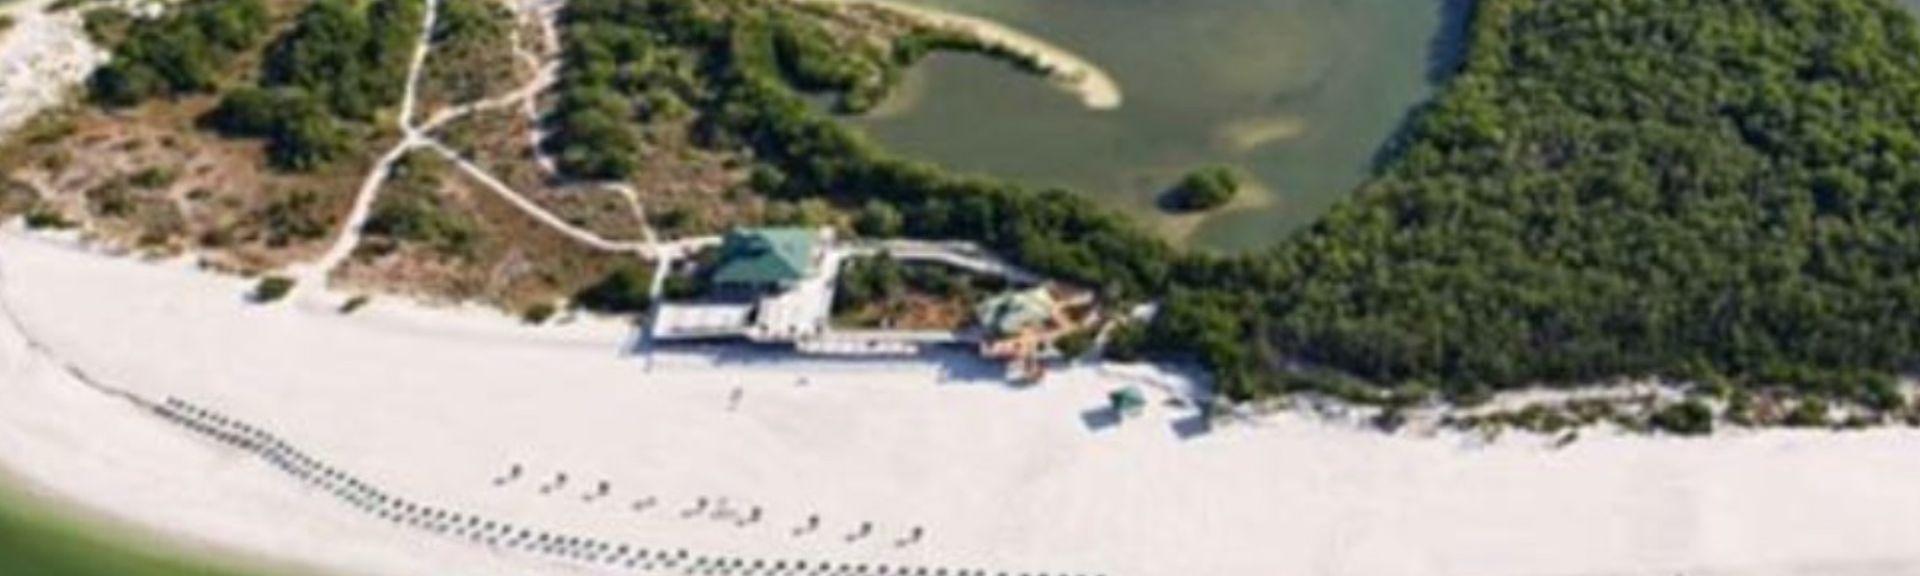 Pelican Landing, Bonita Springs, FL, USA